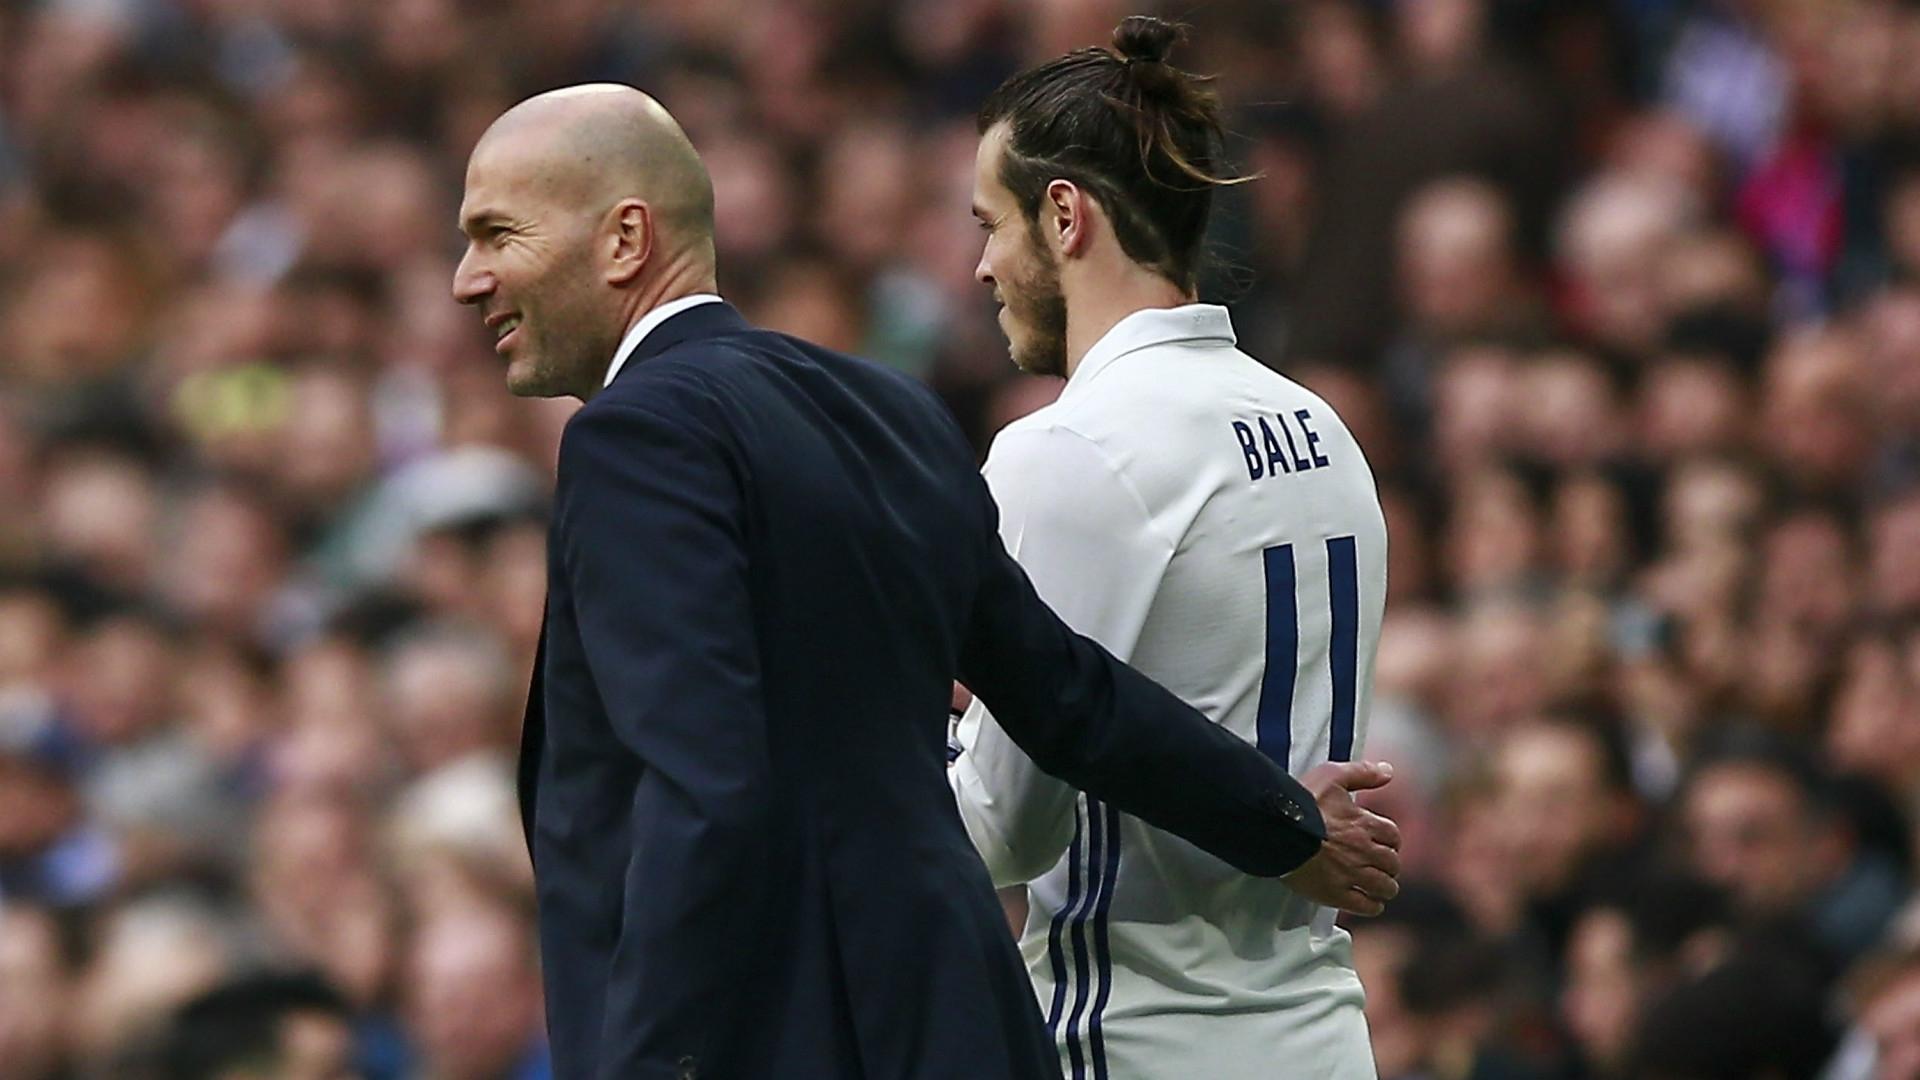 Real Madrid's Zinedine Zidane and midfielder Gareth Bale